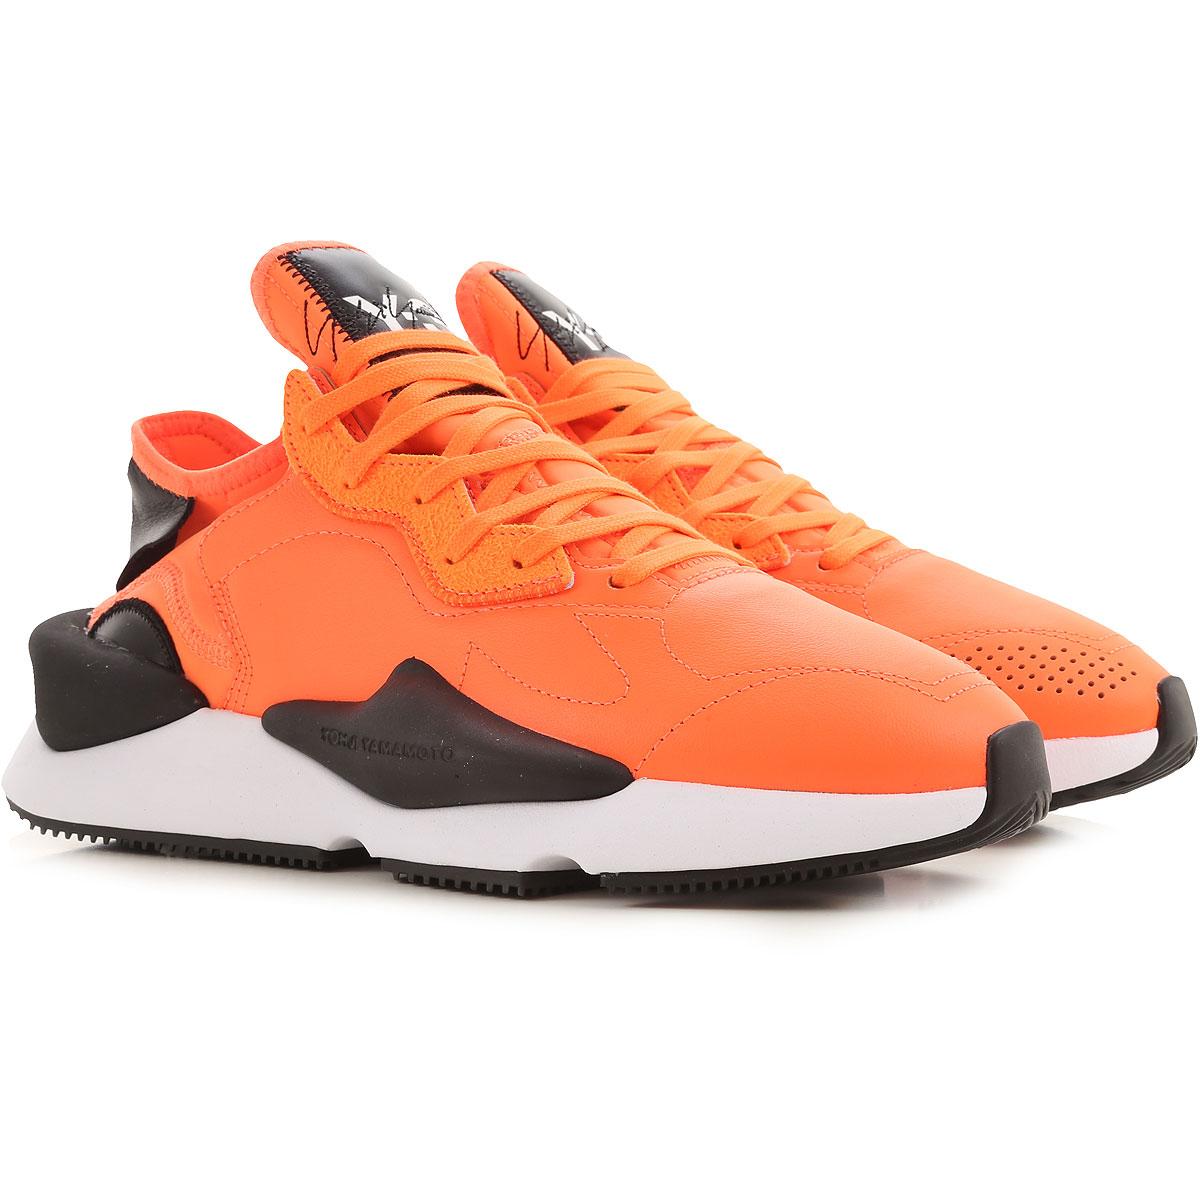 Y3 by Yohji Yamamoto Sneakers for Men On Sale, Fluo Orange, Leather, 2019, 10 8.5